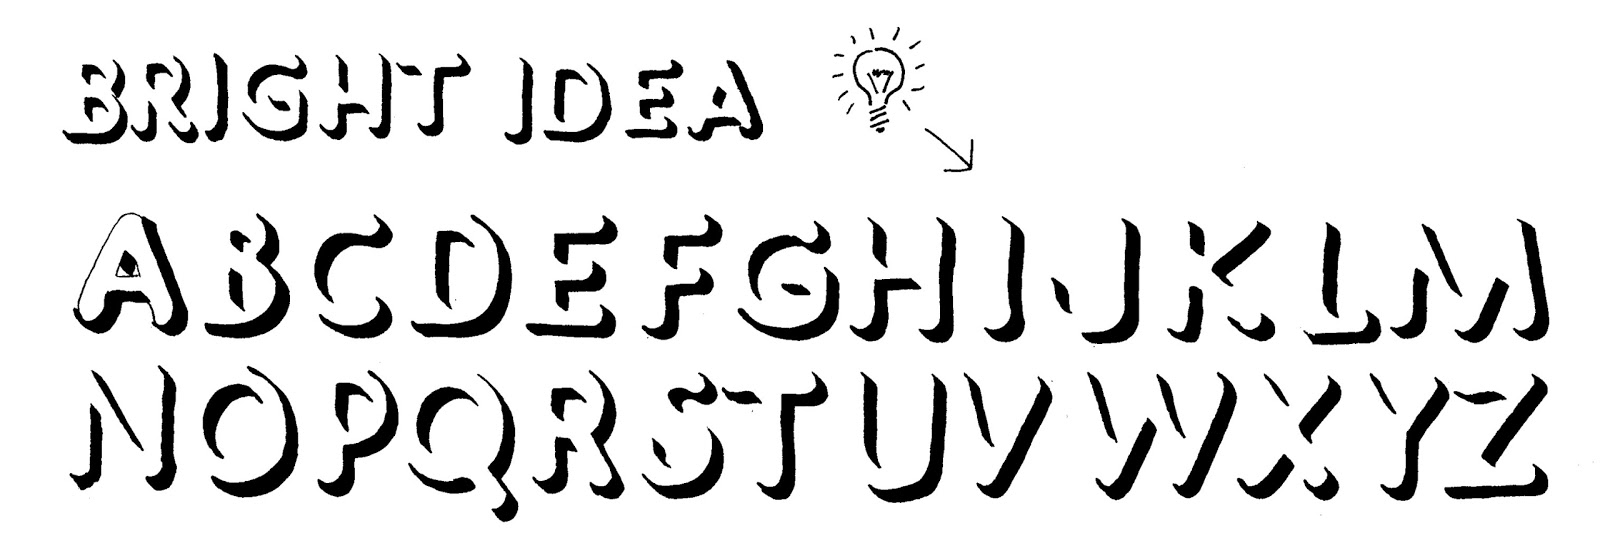 Margaret Shepherd Calligraphy Blog 67 Bright Idea